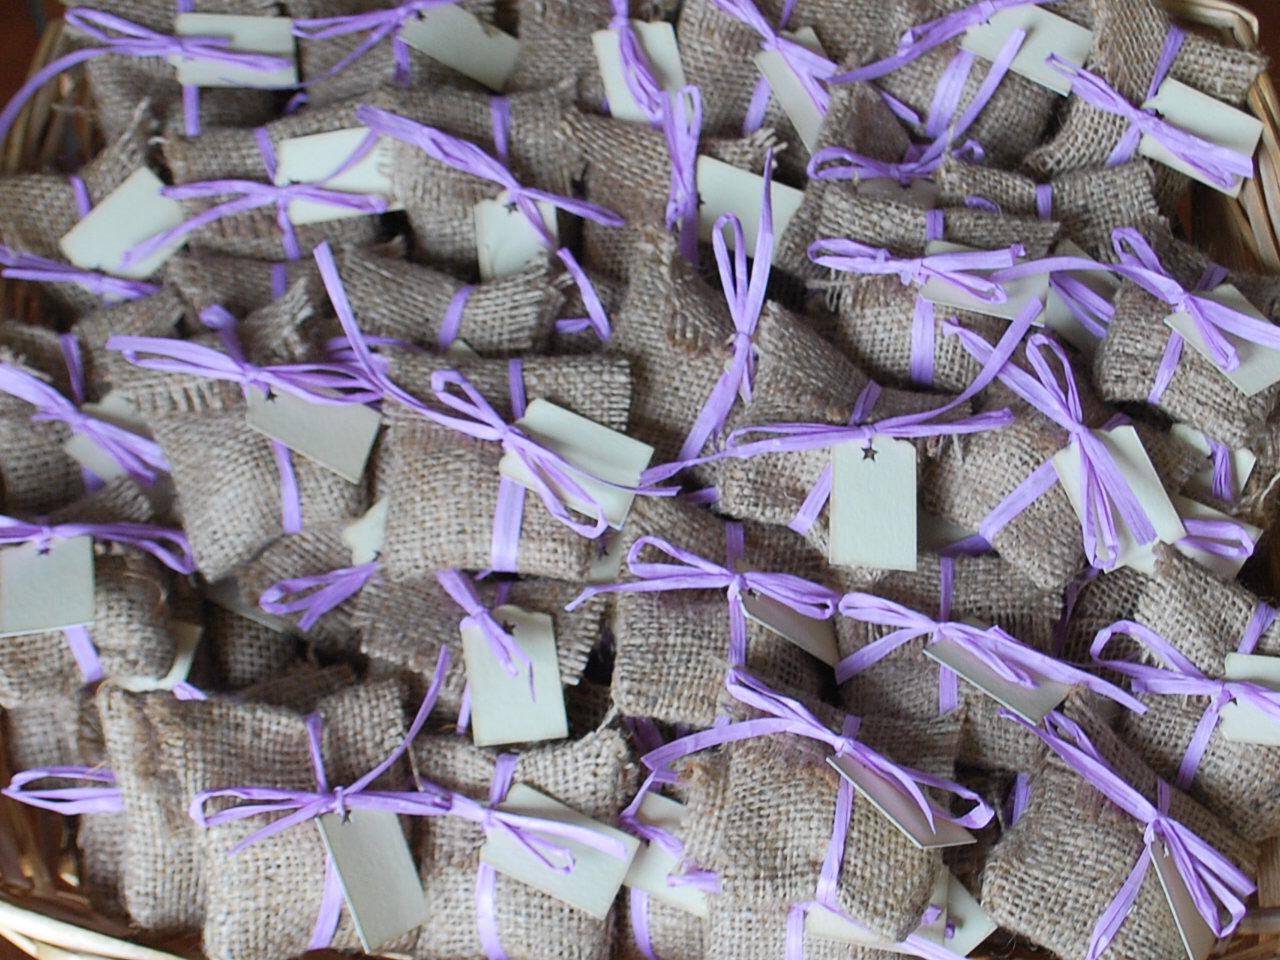 Matrimonio In Glicine : Allestimento giardino per matrimonio centrotavola battesimo fai